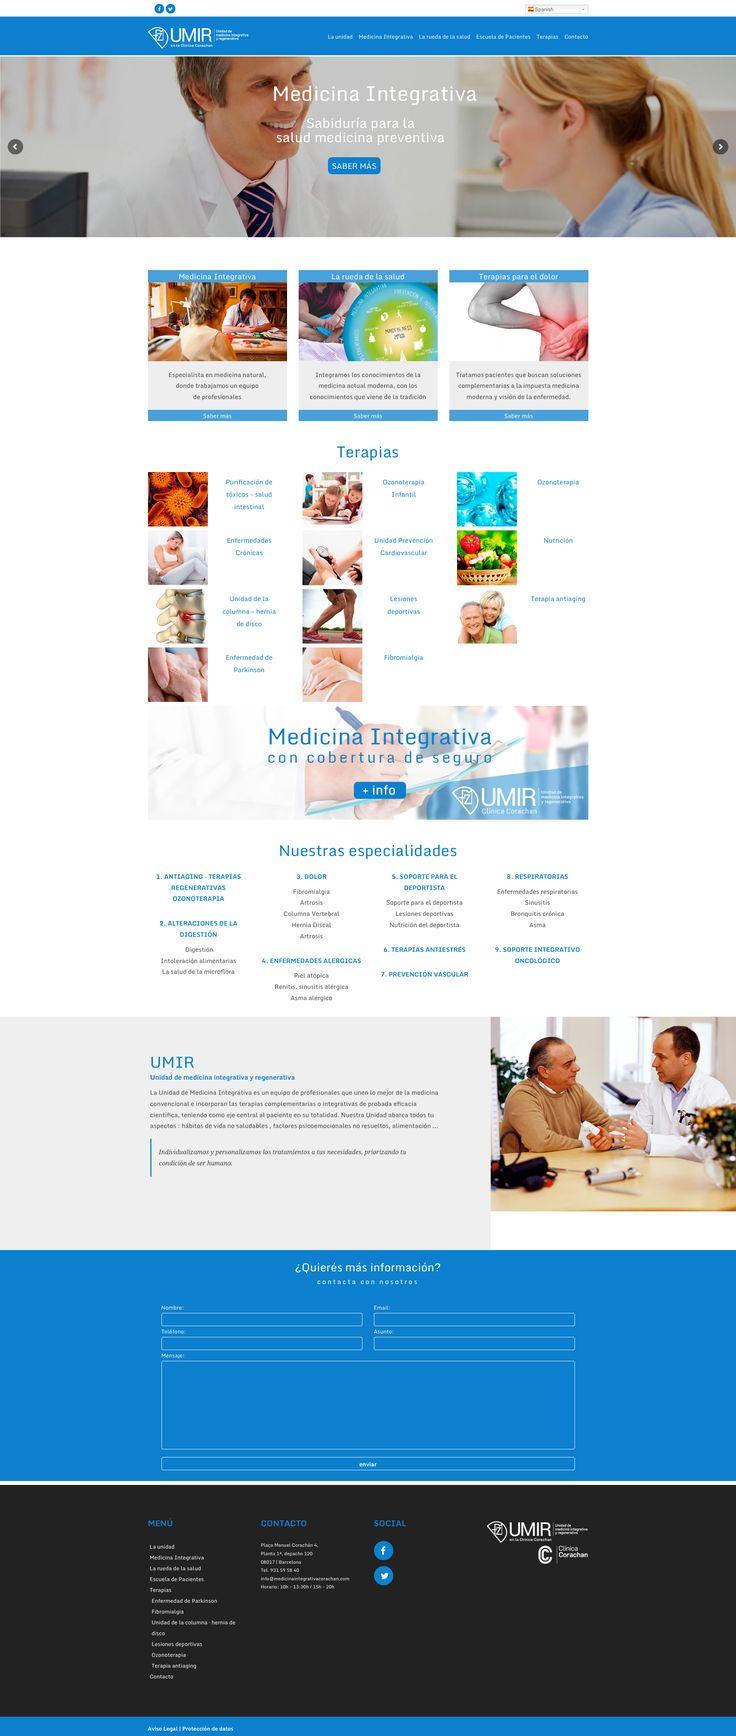 Web para la Unidad de medicina integrativa y regenerativa - UMIR - #laende #web #design #medicina #integrativa #natural #clinica #corachan